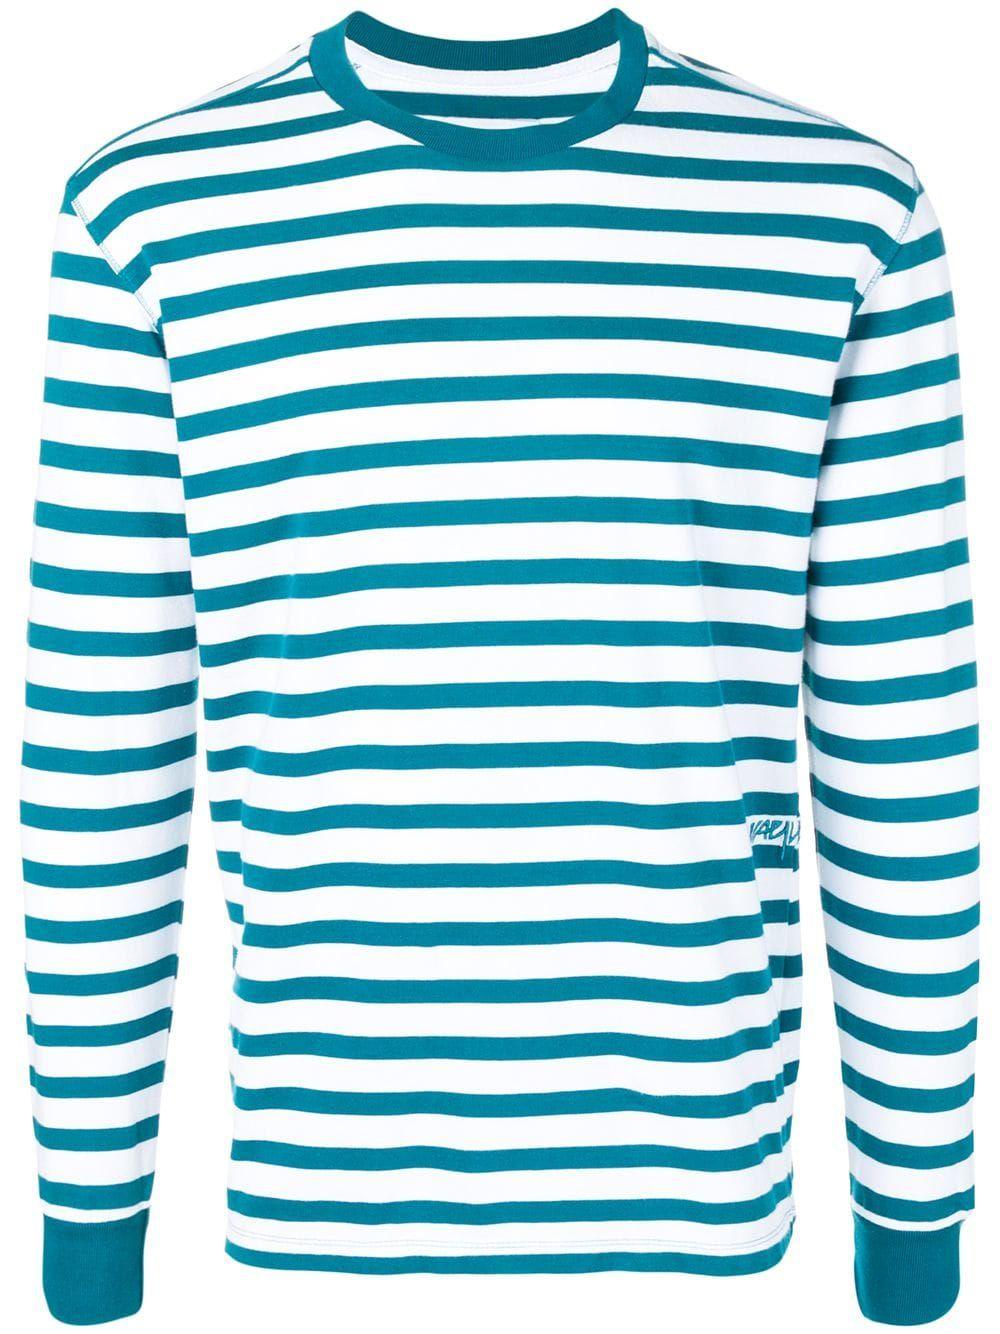 Küchendesign hong kong pop trading international pop trading international striped jumper